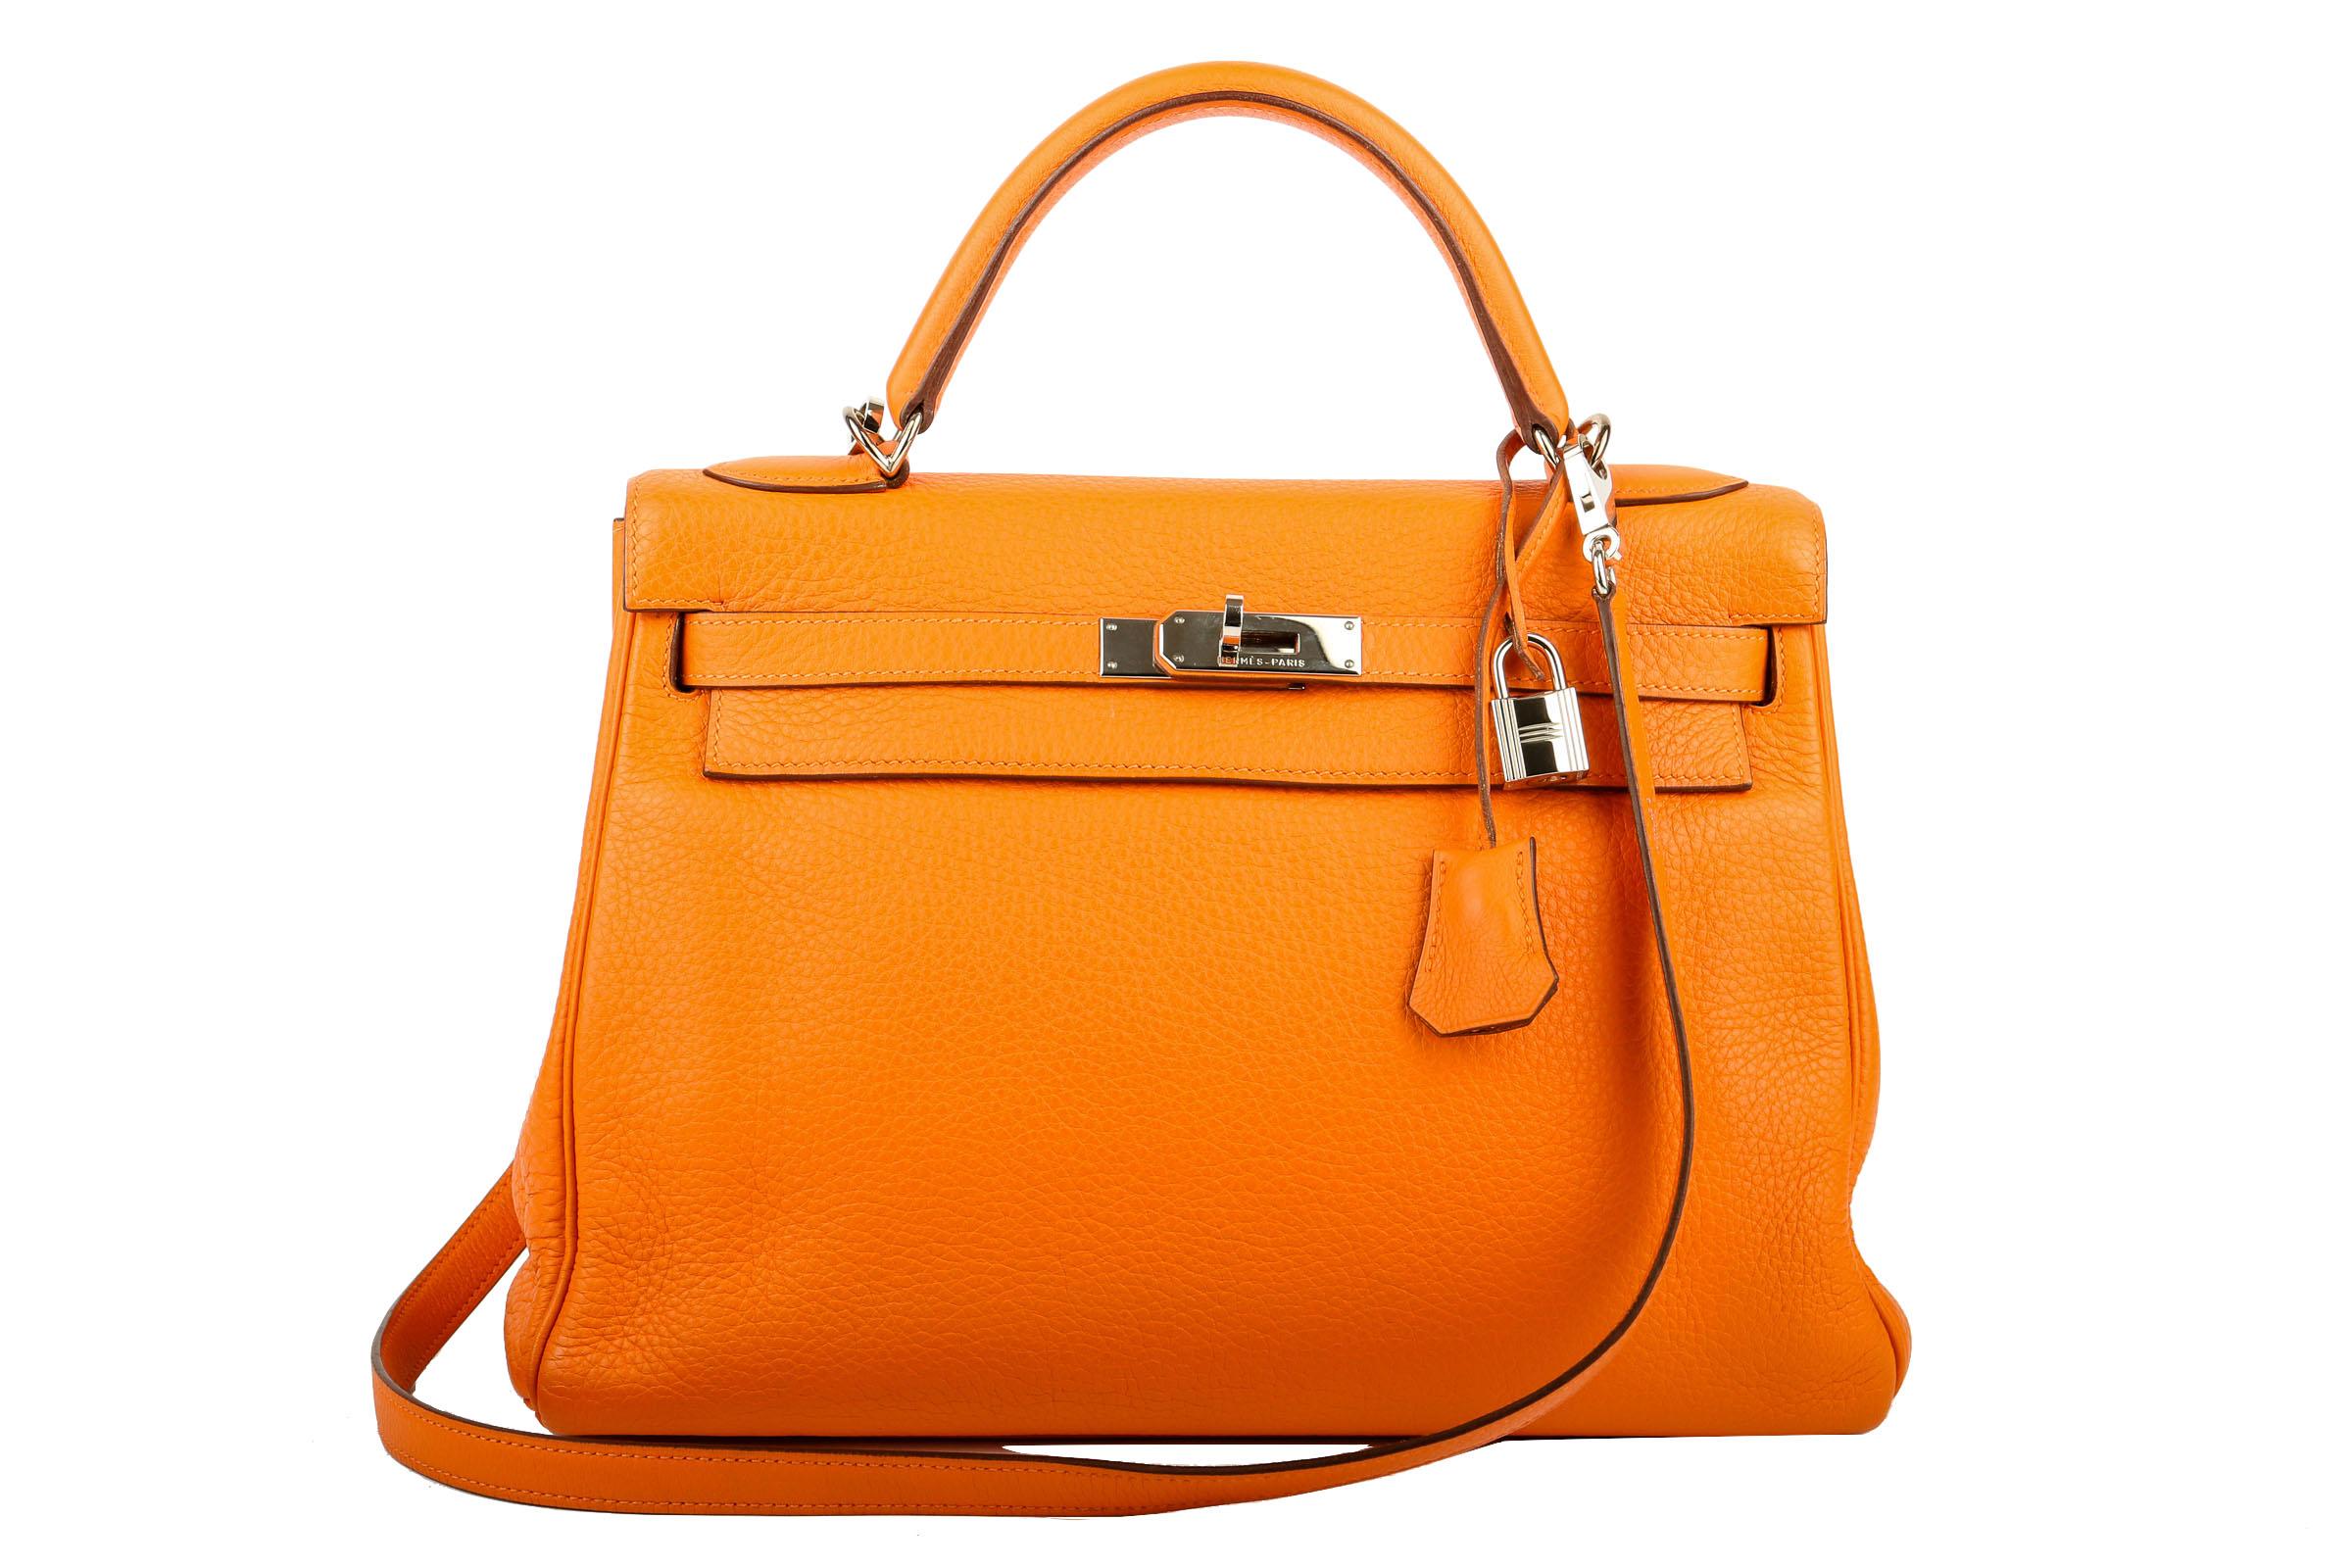 20e090b0d69d8 Vorschau  Hermès Kelly Bag 32 Togo Orange